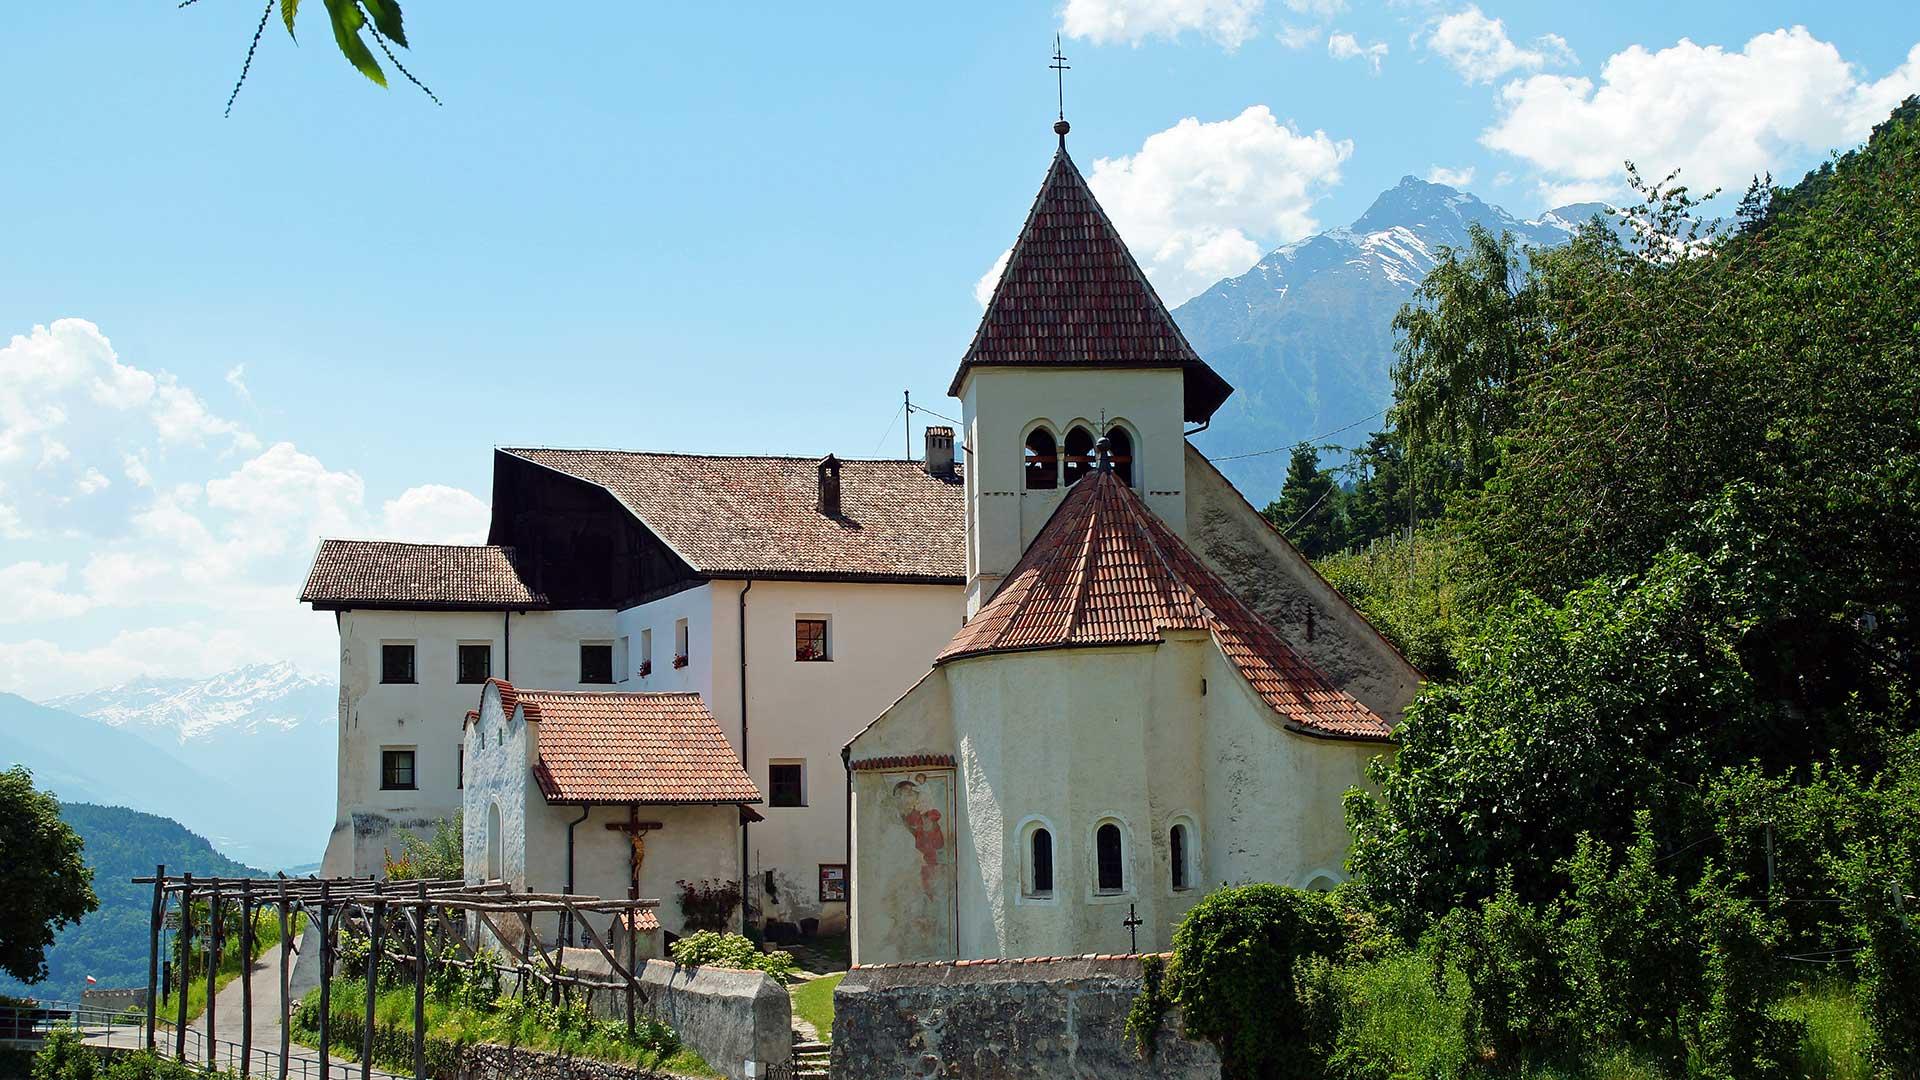 Pfarrkirche St. Peter - Dorf Tirol